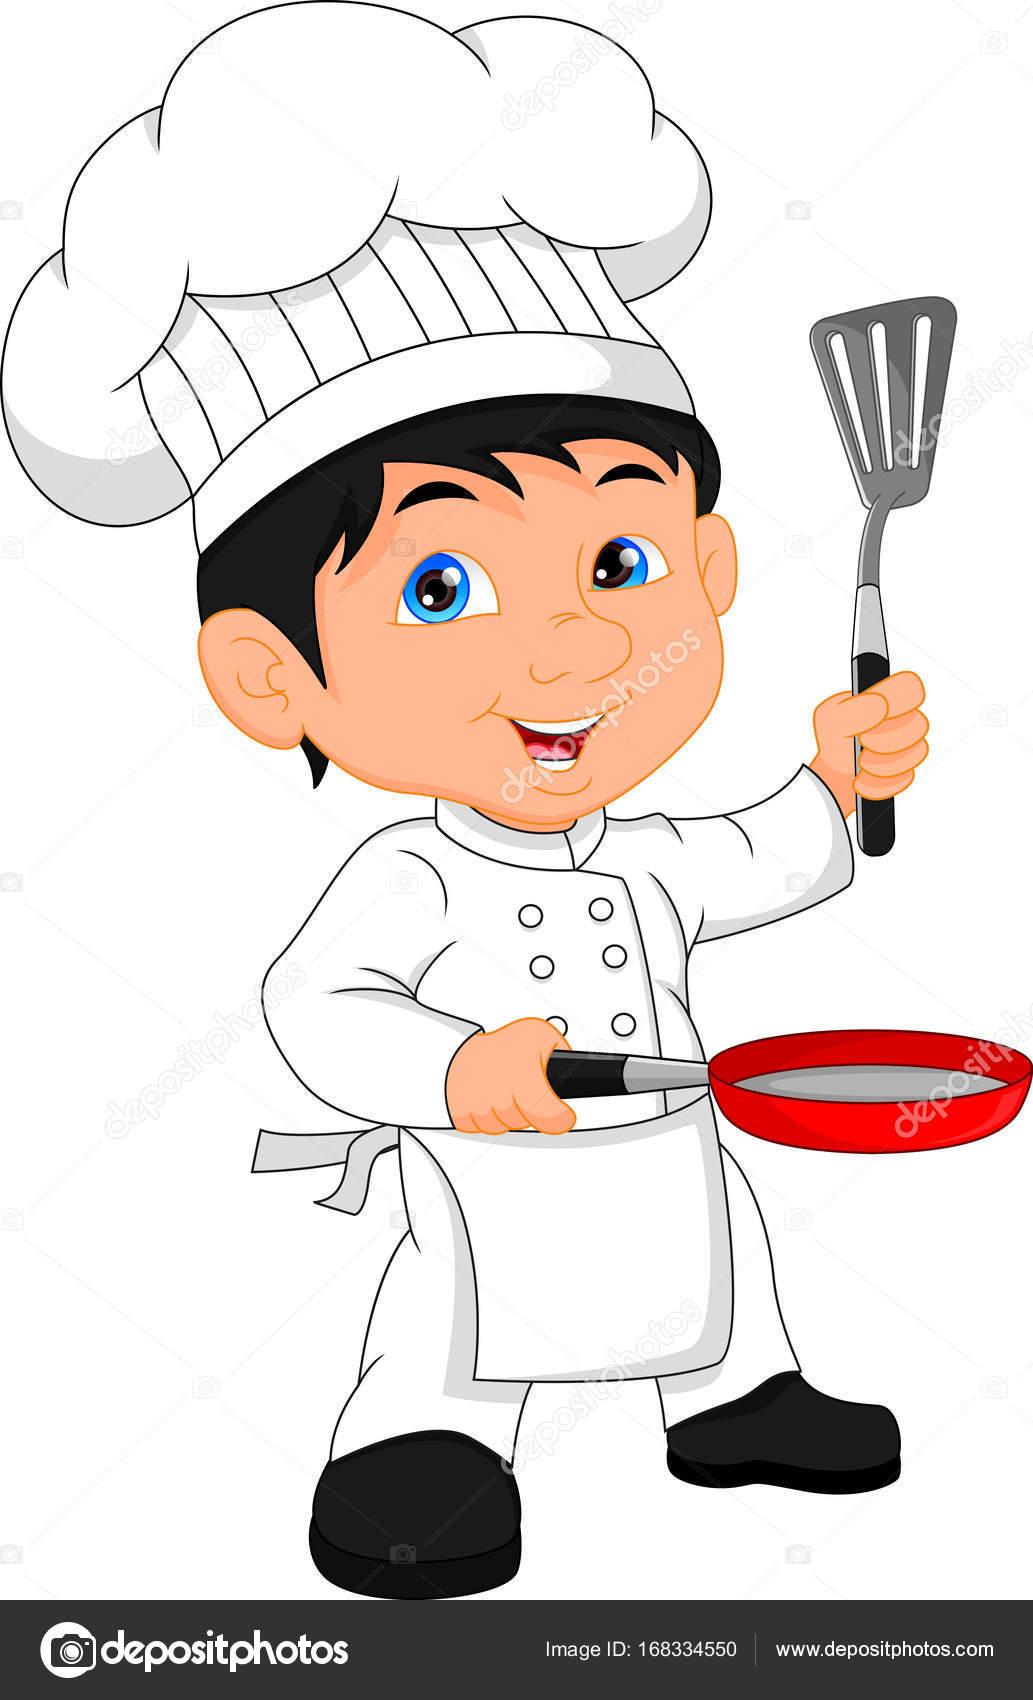 boy chef cartoon stock vector lawangdesign 168334550 rh depositphotos com chef cartoon maker chef cartoon images